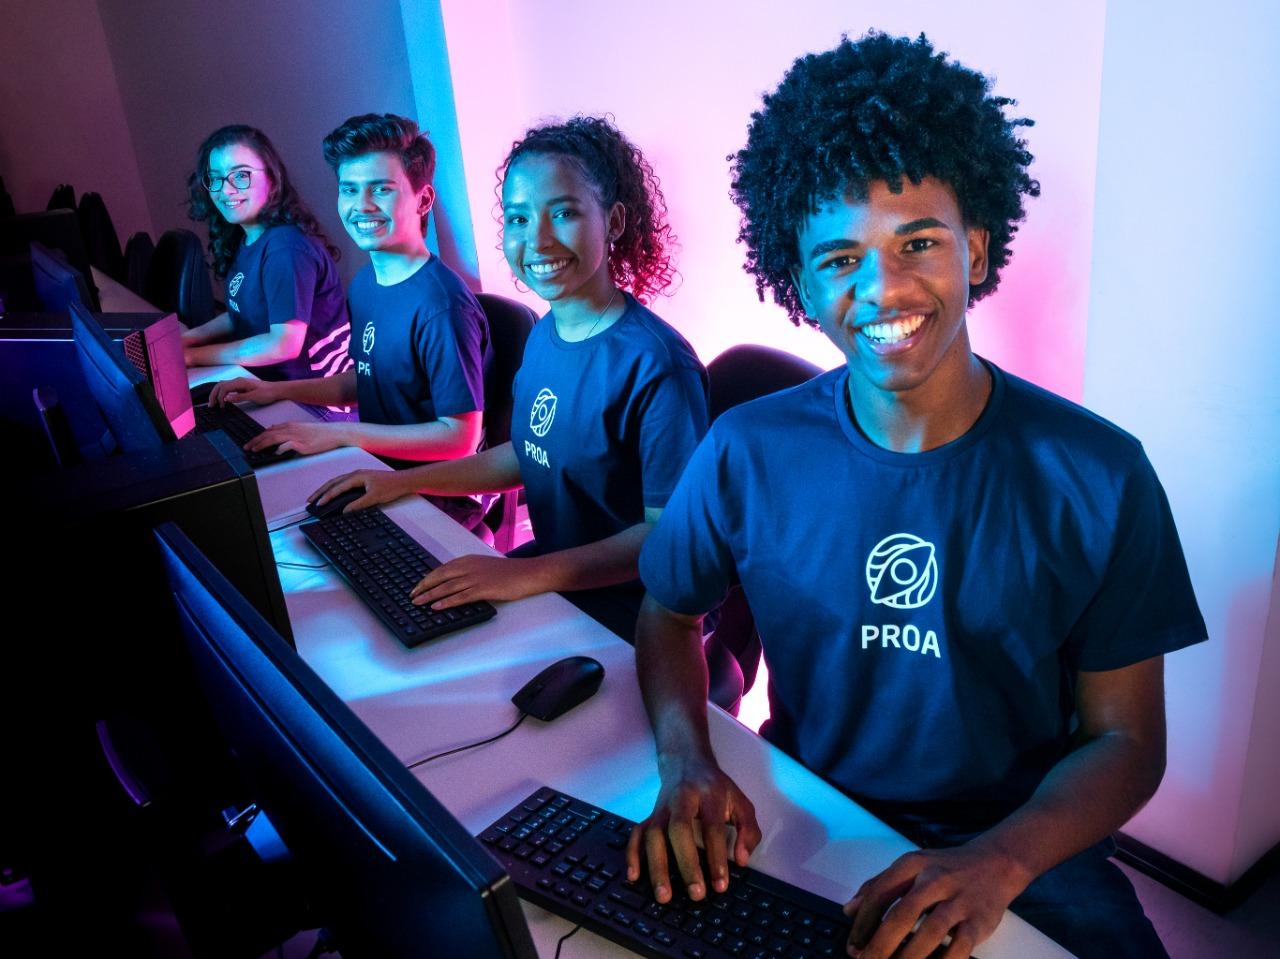 Instituto PROA abre 150 vagas gratuitas para curso profissionalizante na área de tecnologia